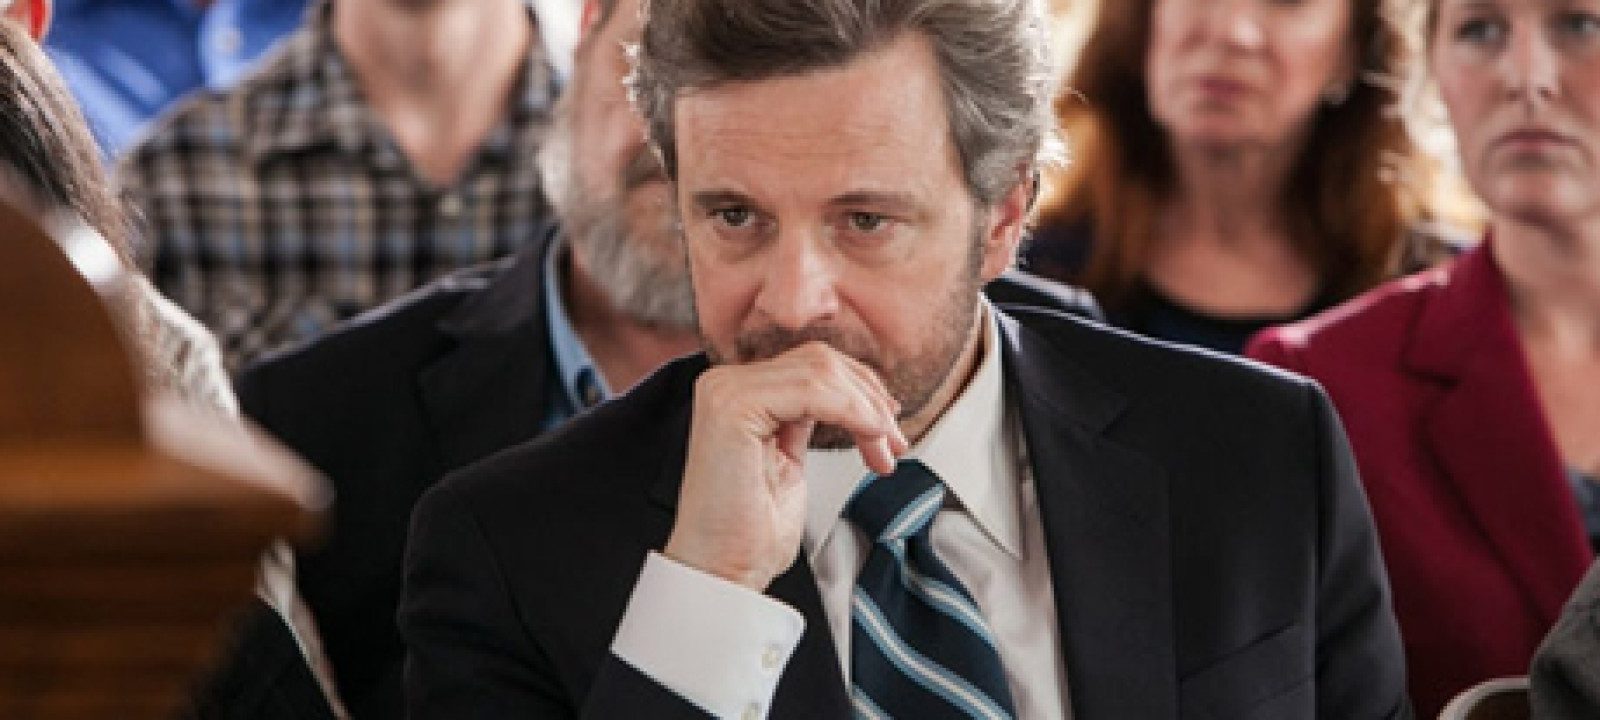 Colin Firth, Devil's Knot, FINAL